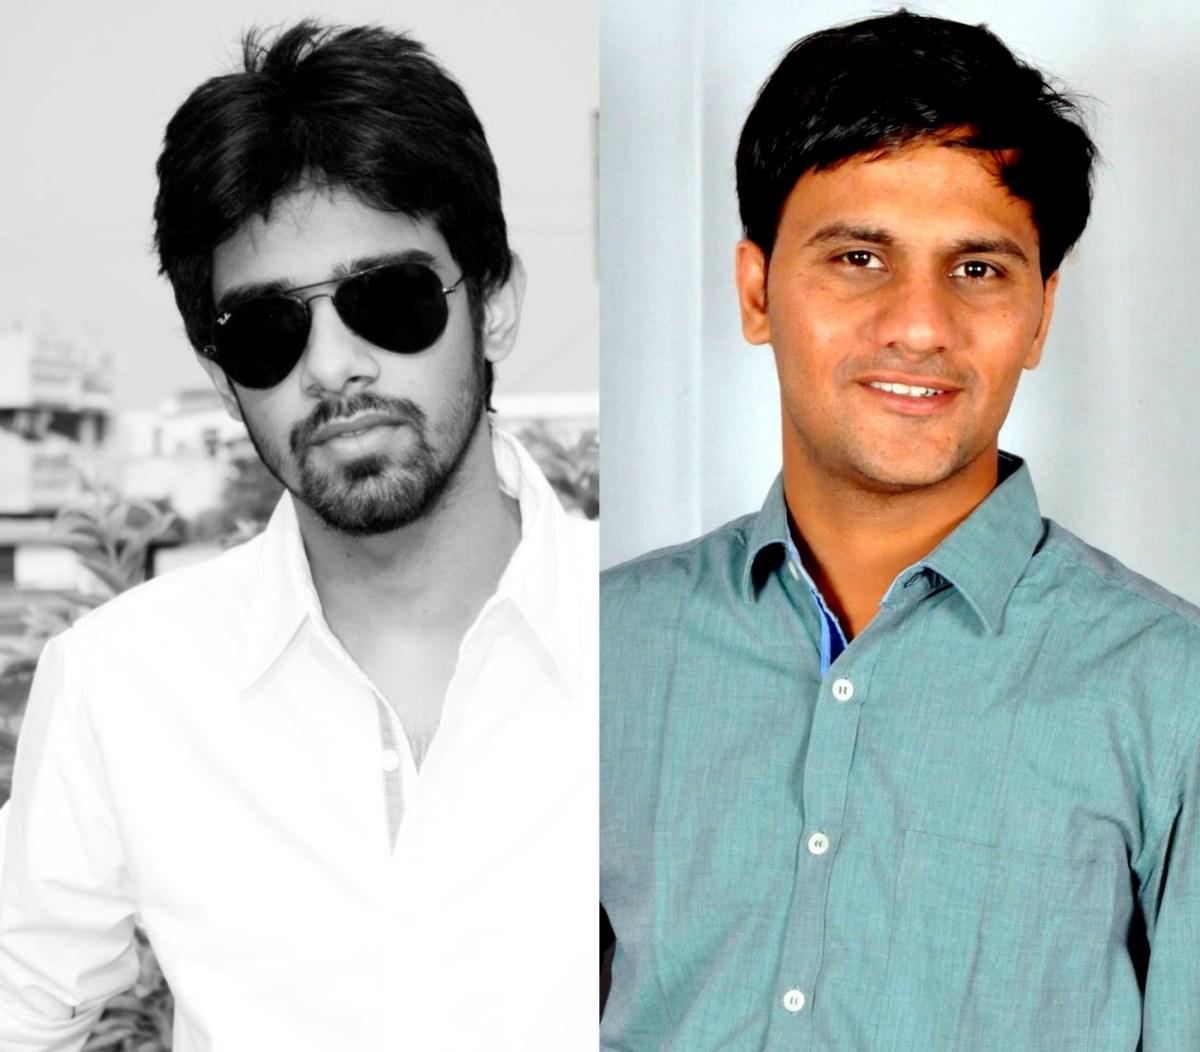 Sameer K Singh & Vipin Soni